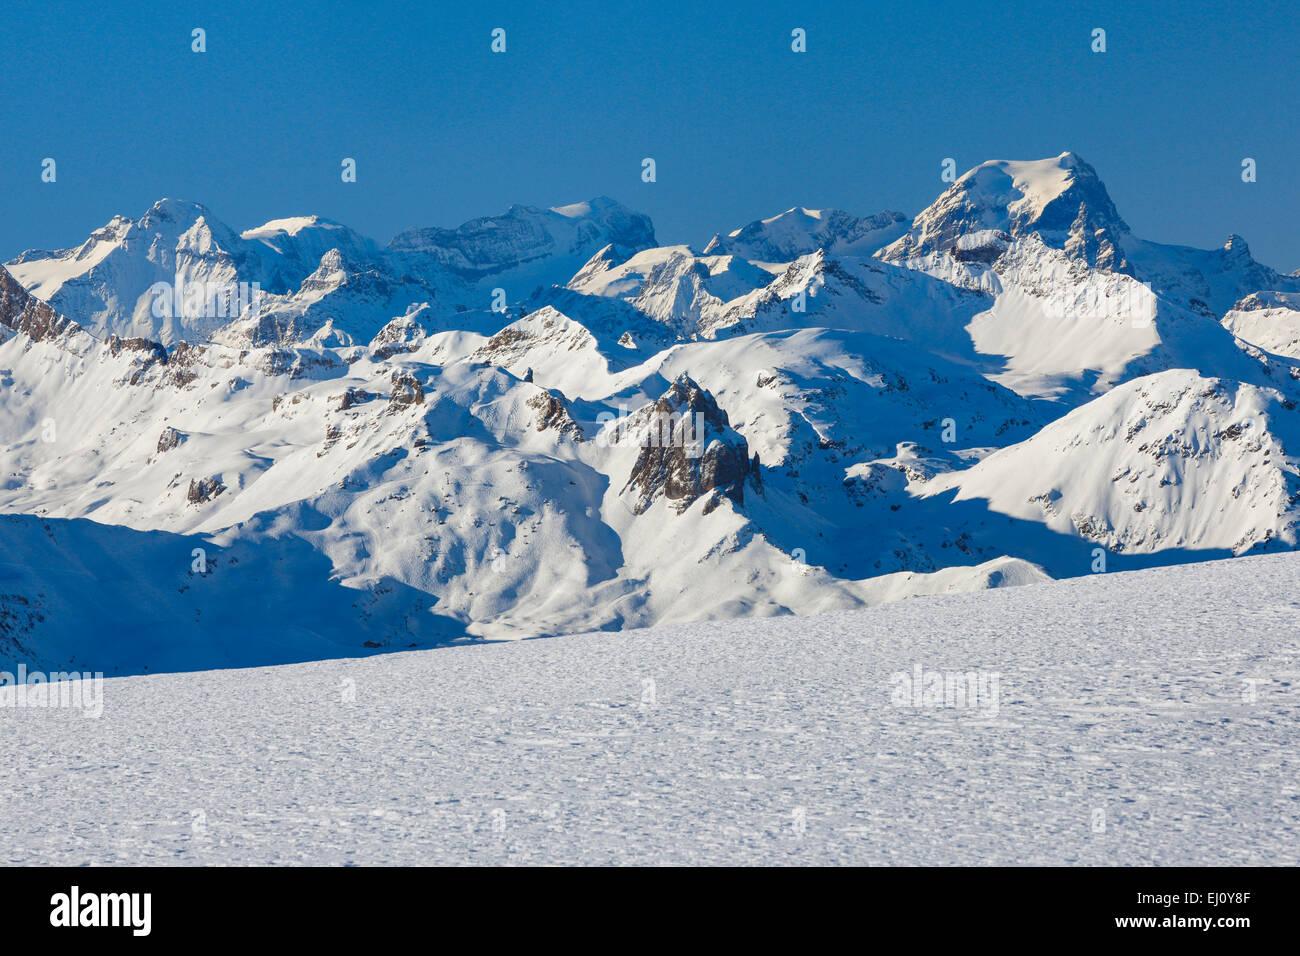 Alps, view, mountain, mountain panorama, mountains, mountain massif, Chäserrugg, mountains, Glarus Alps, sky, - Stock Image